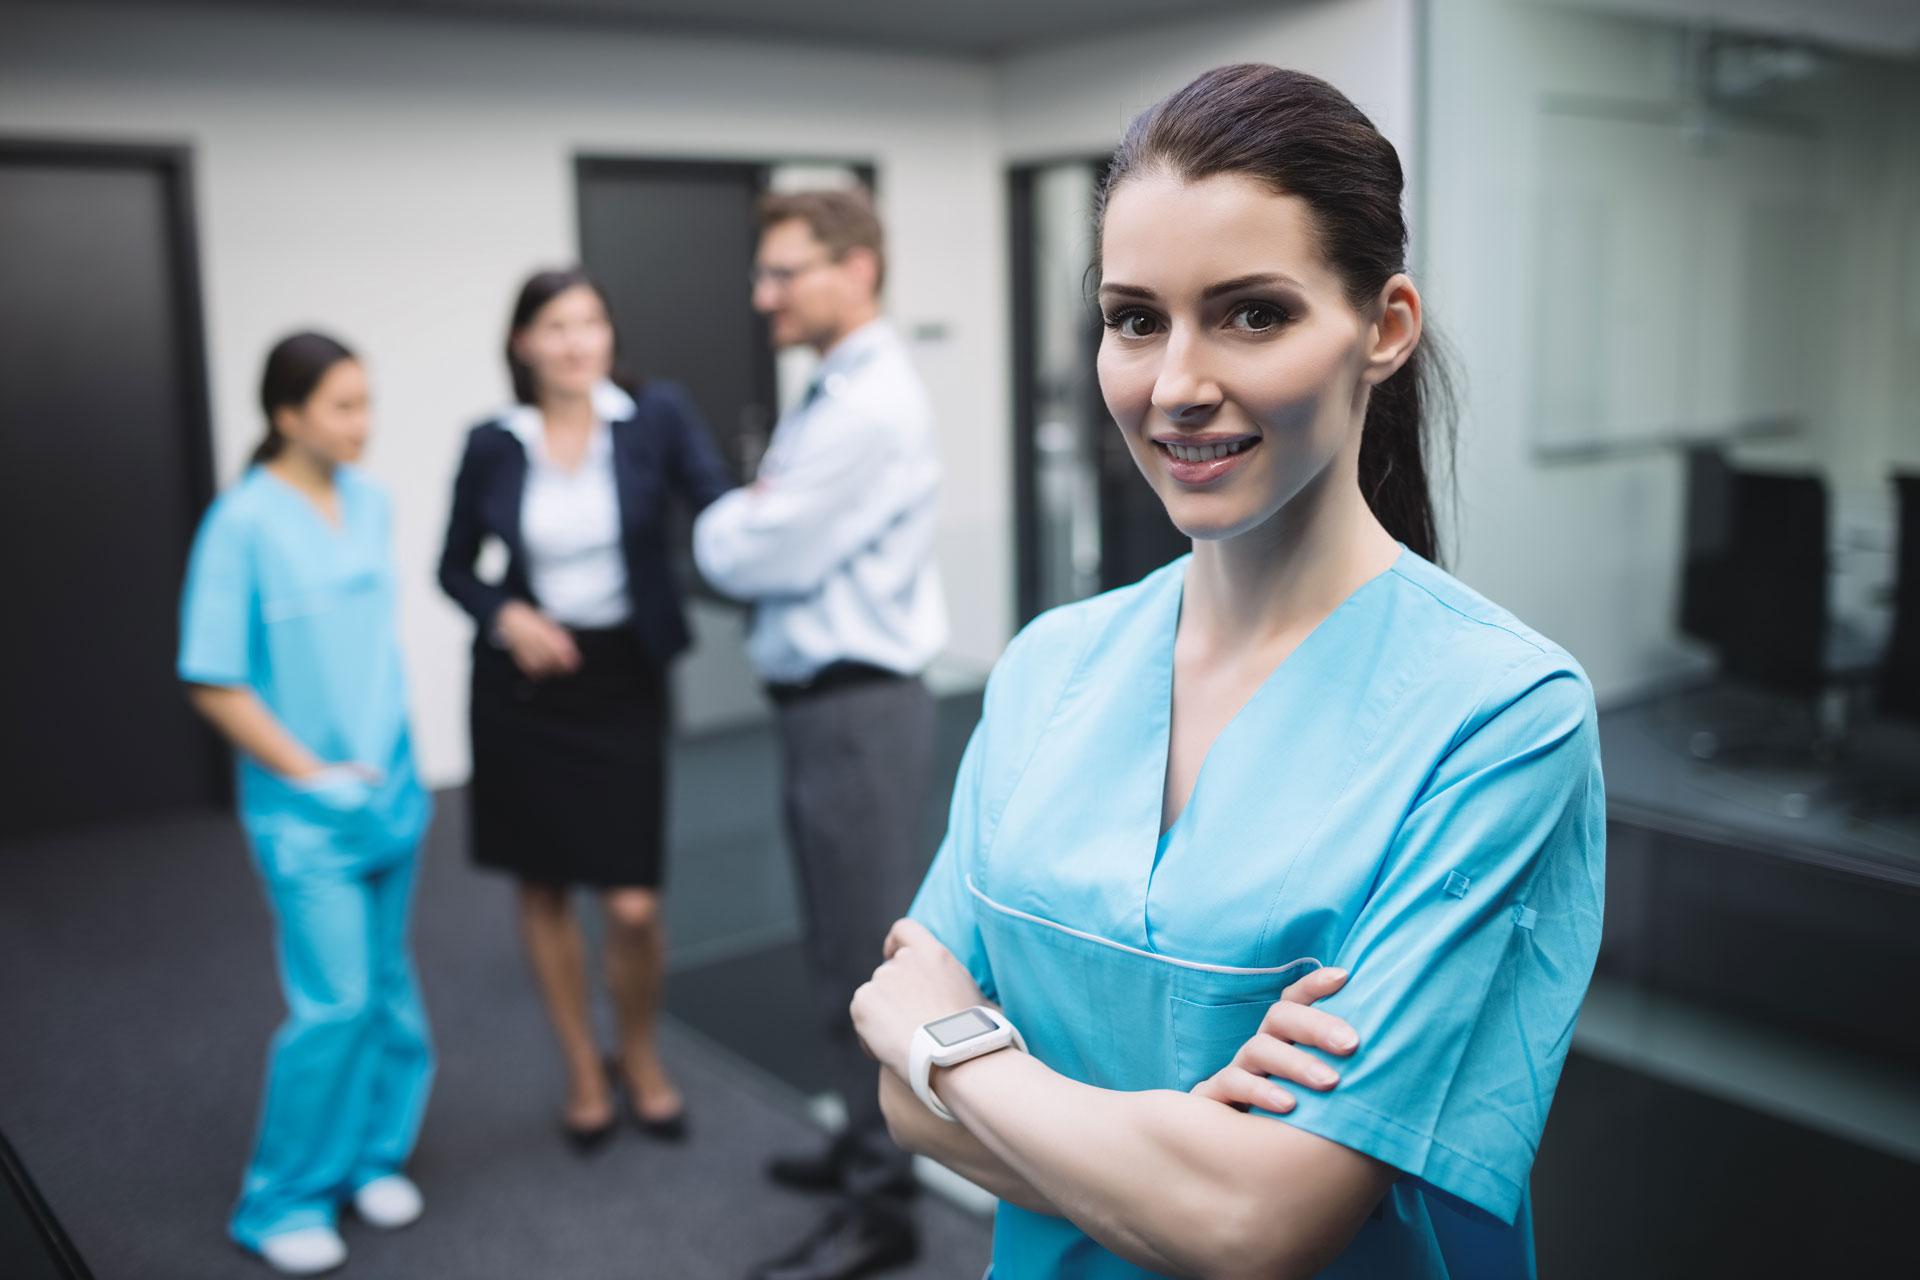 Gerijatrijska sestra – ambulantna skrb (m / ž / d)